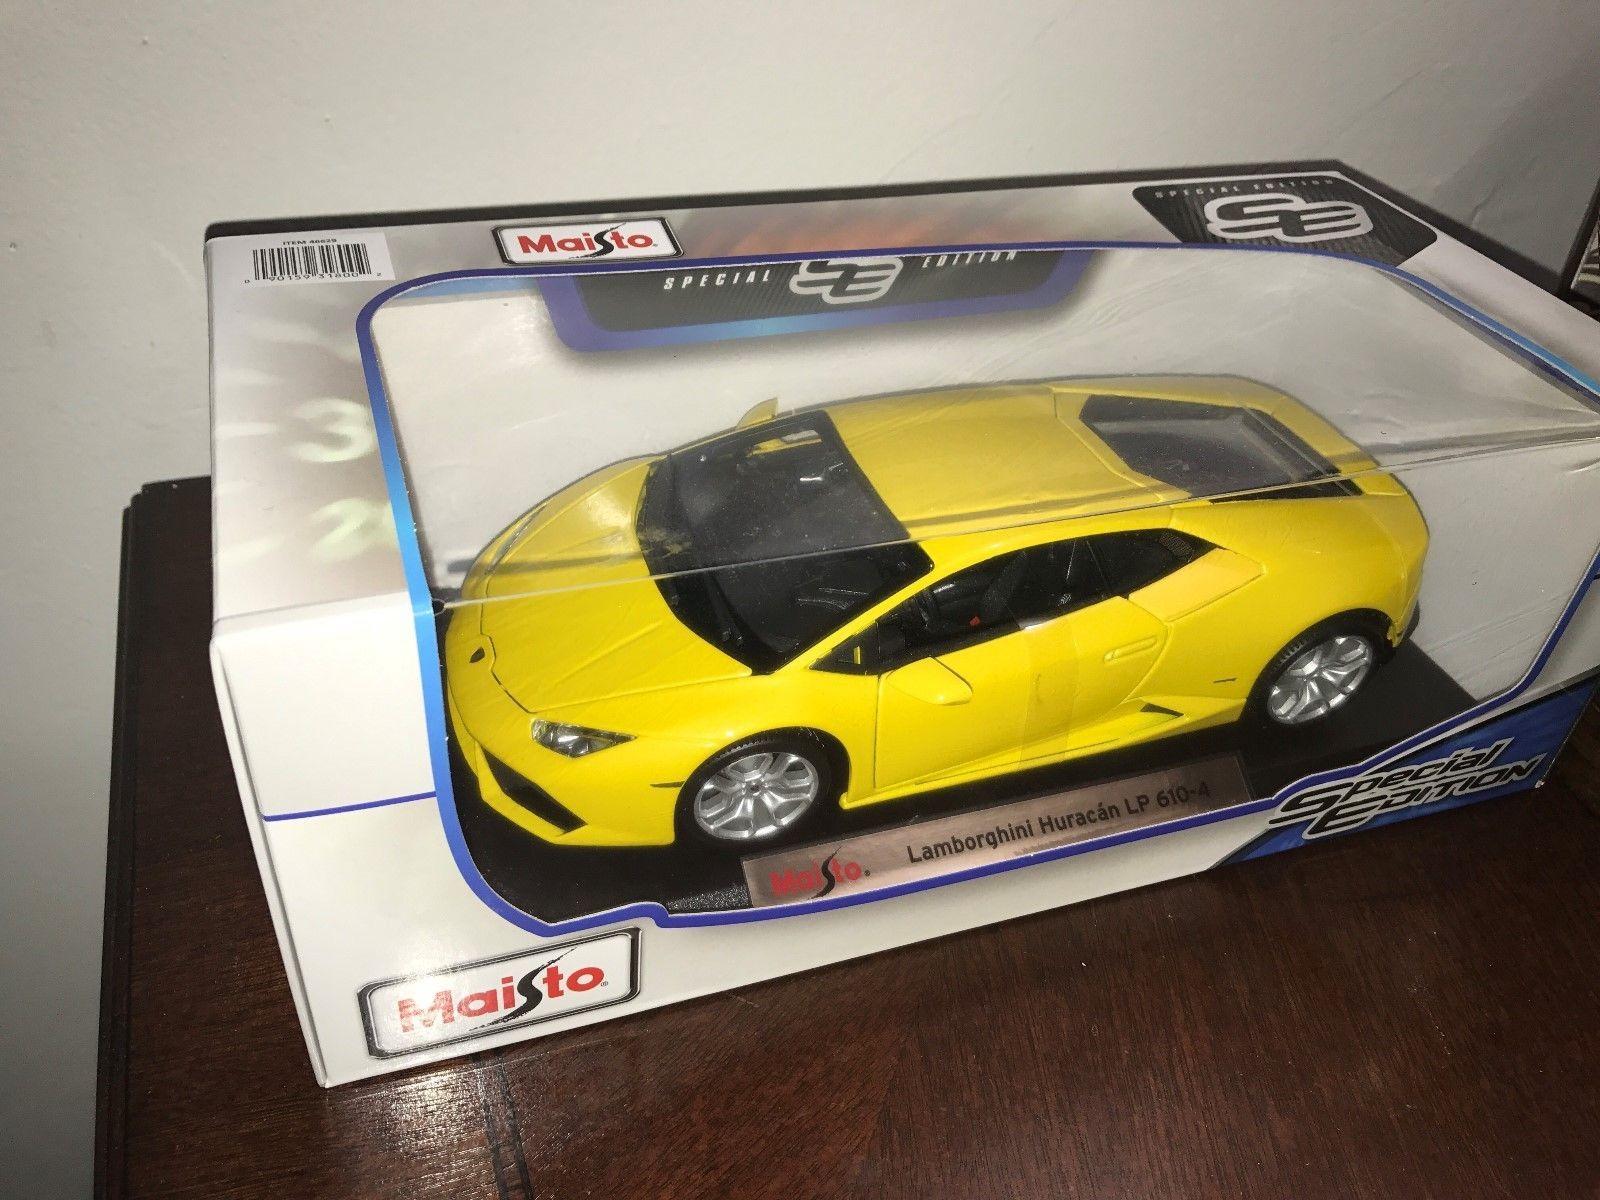 e1658d95cda97858dc3ff43e88a80c23 Marvelous Lamborghini Huracan Hack asphalt 8 Cars Trend